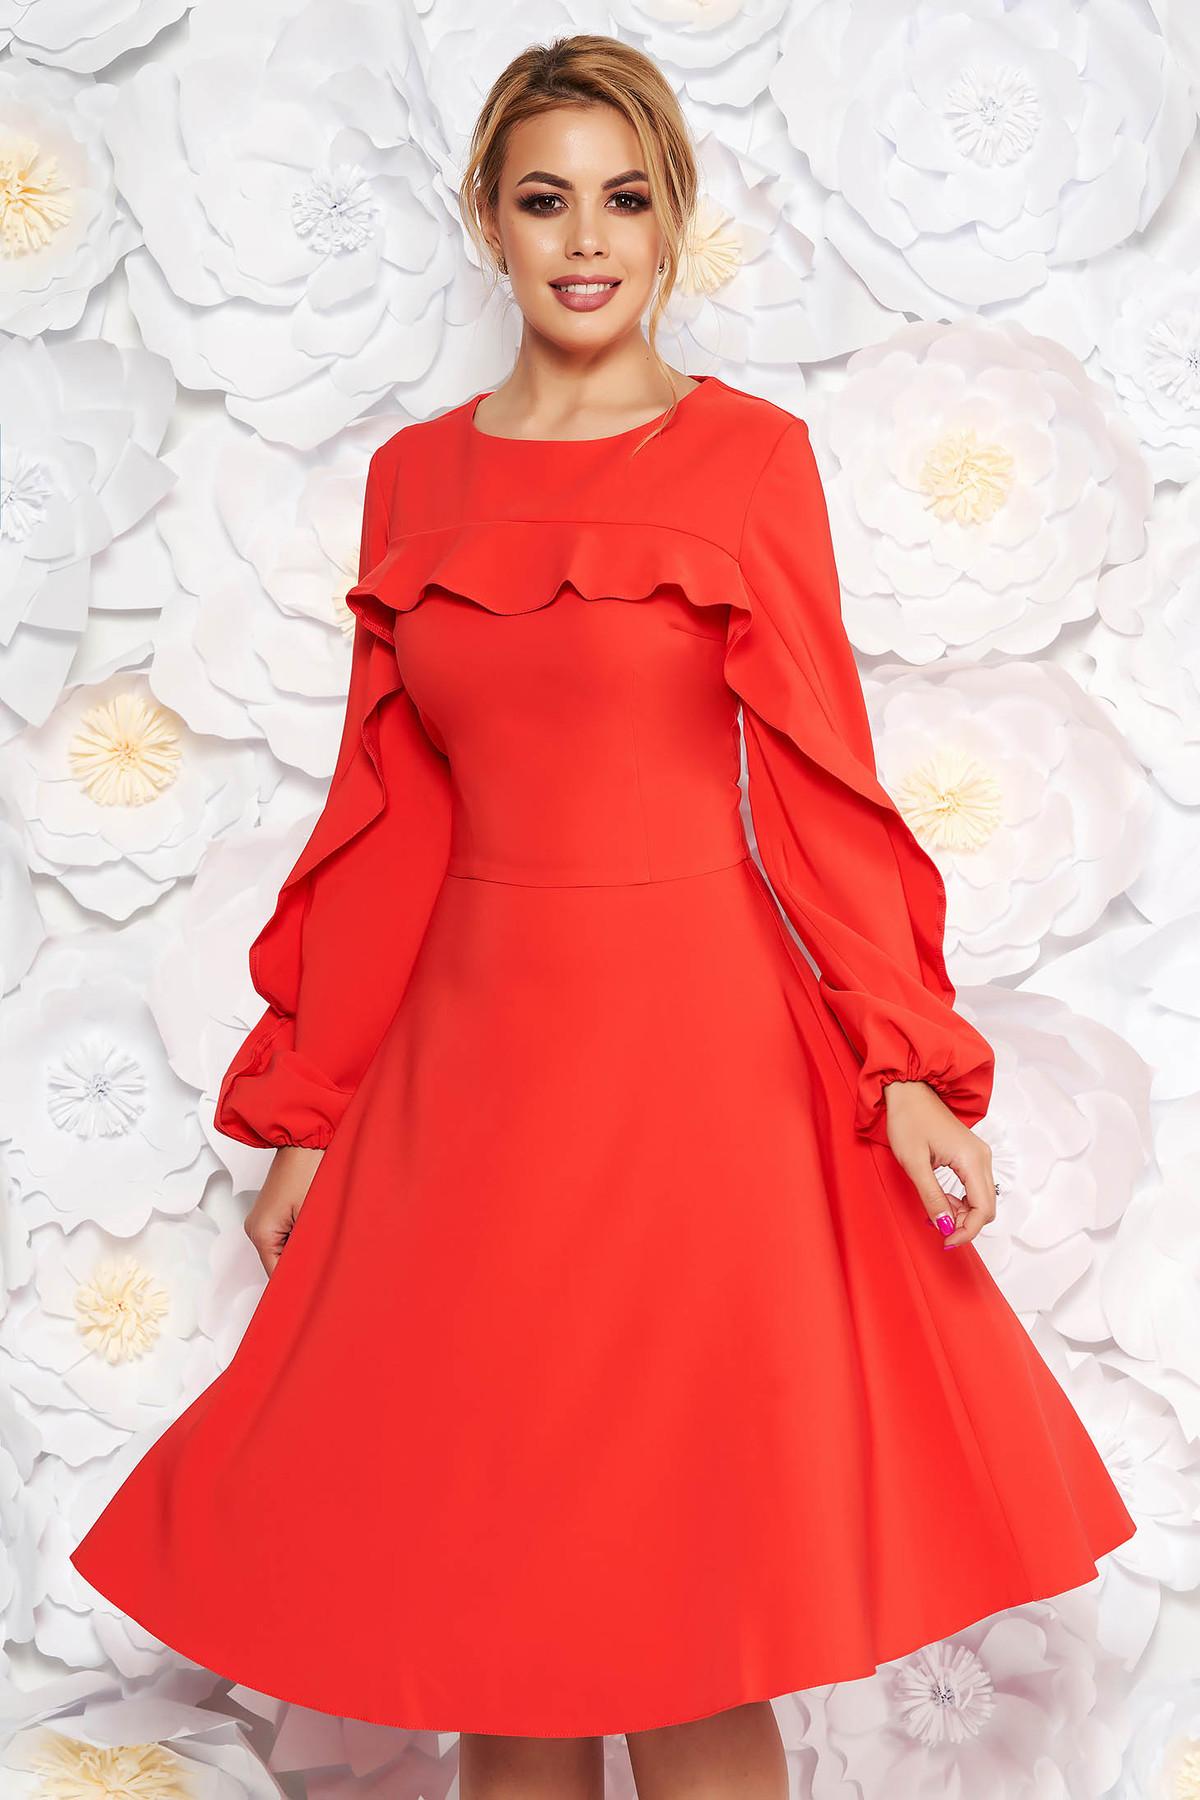 Rochie LaDonna corai eleganta in clos din stofa usor elastica captusita pe interior cu volanase